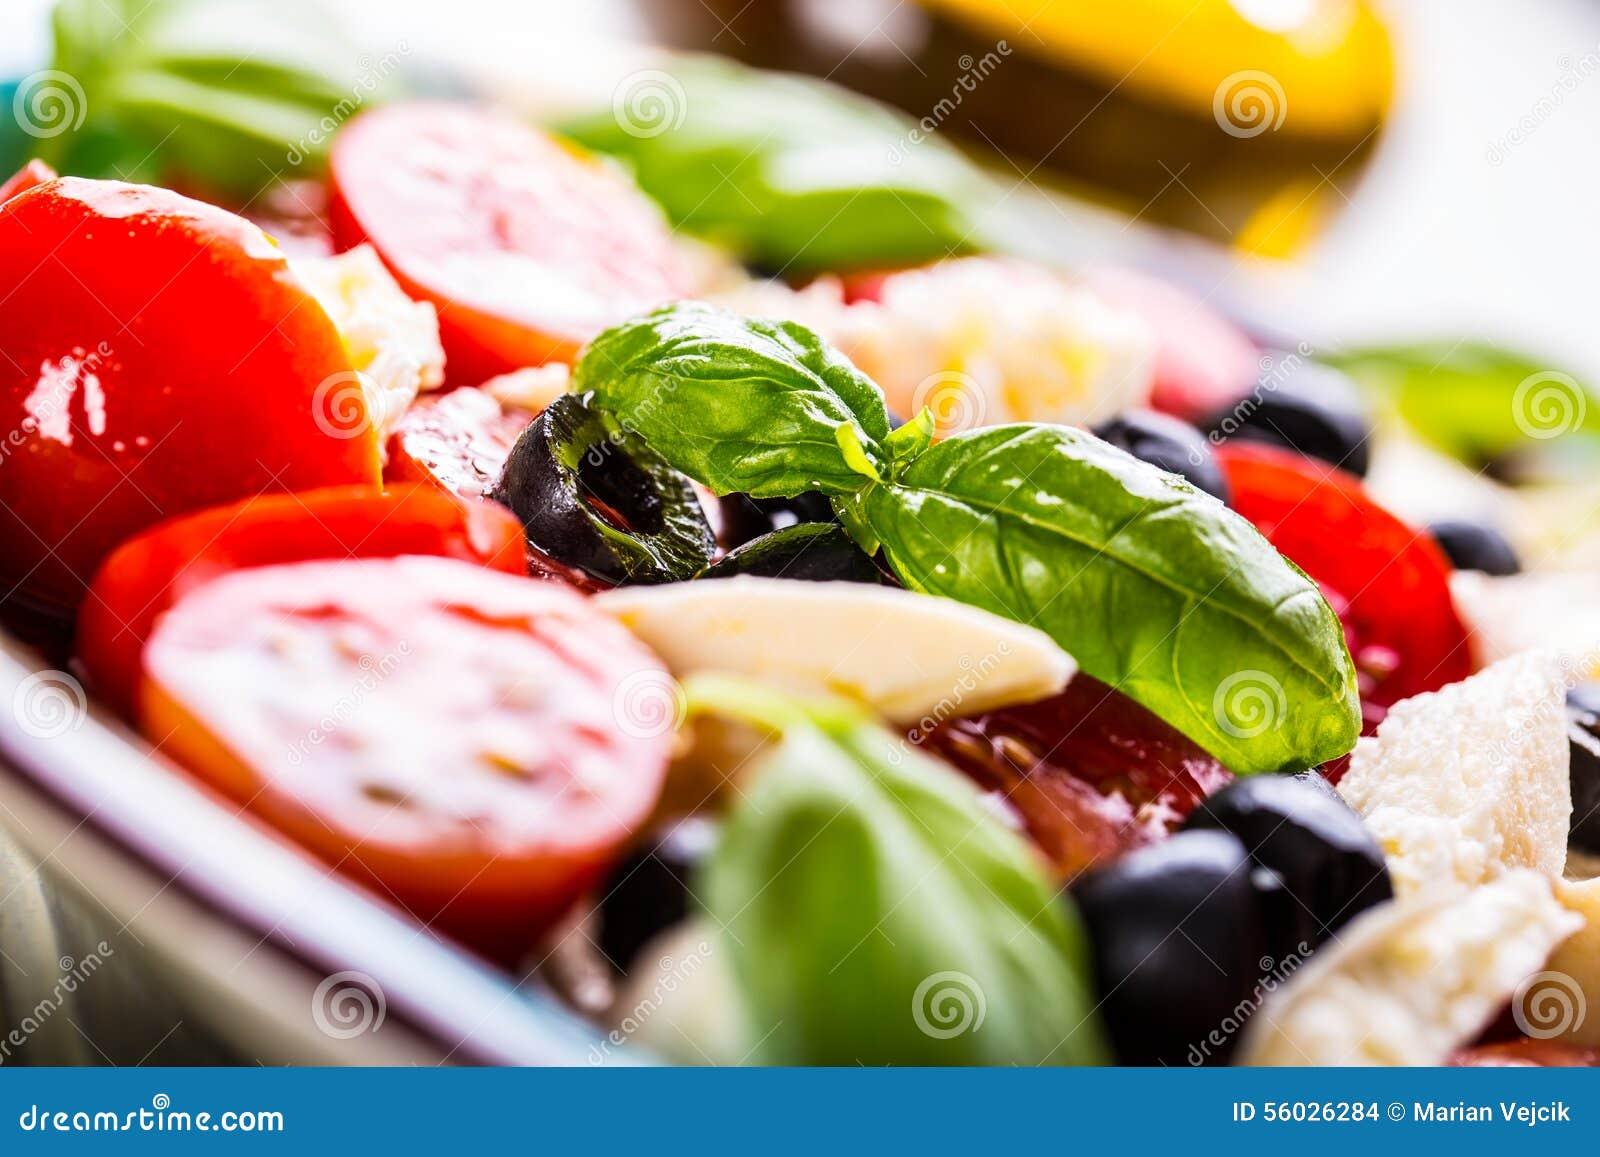 Caprese Salada de Caprese Salada italiana Salada mediterrânea Culinária italiana Culinária mediterrânea